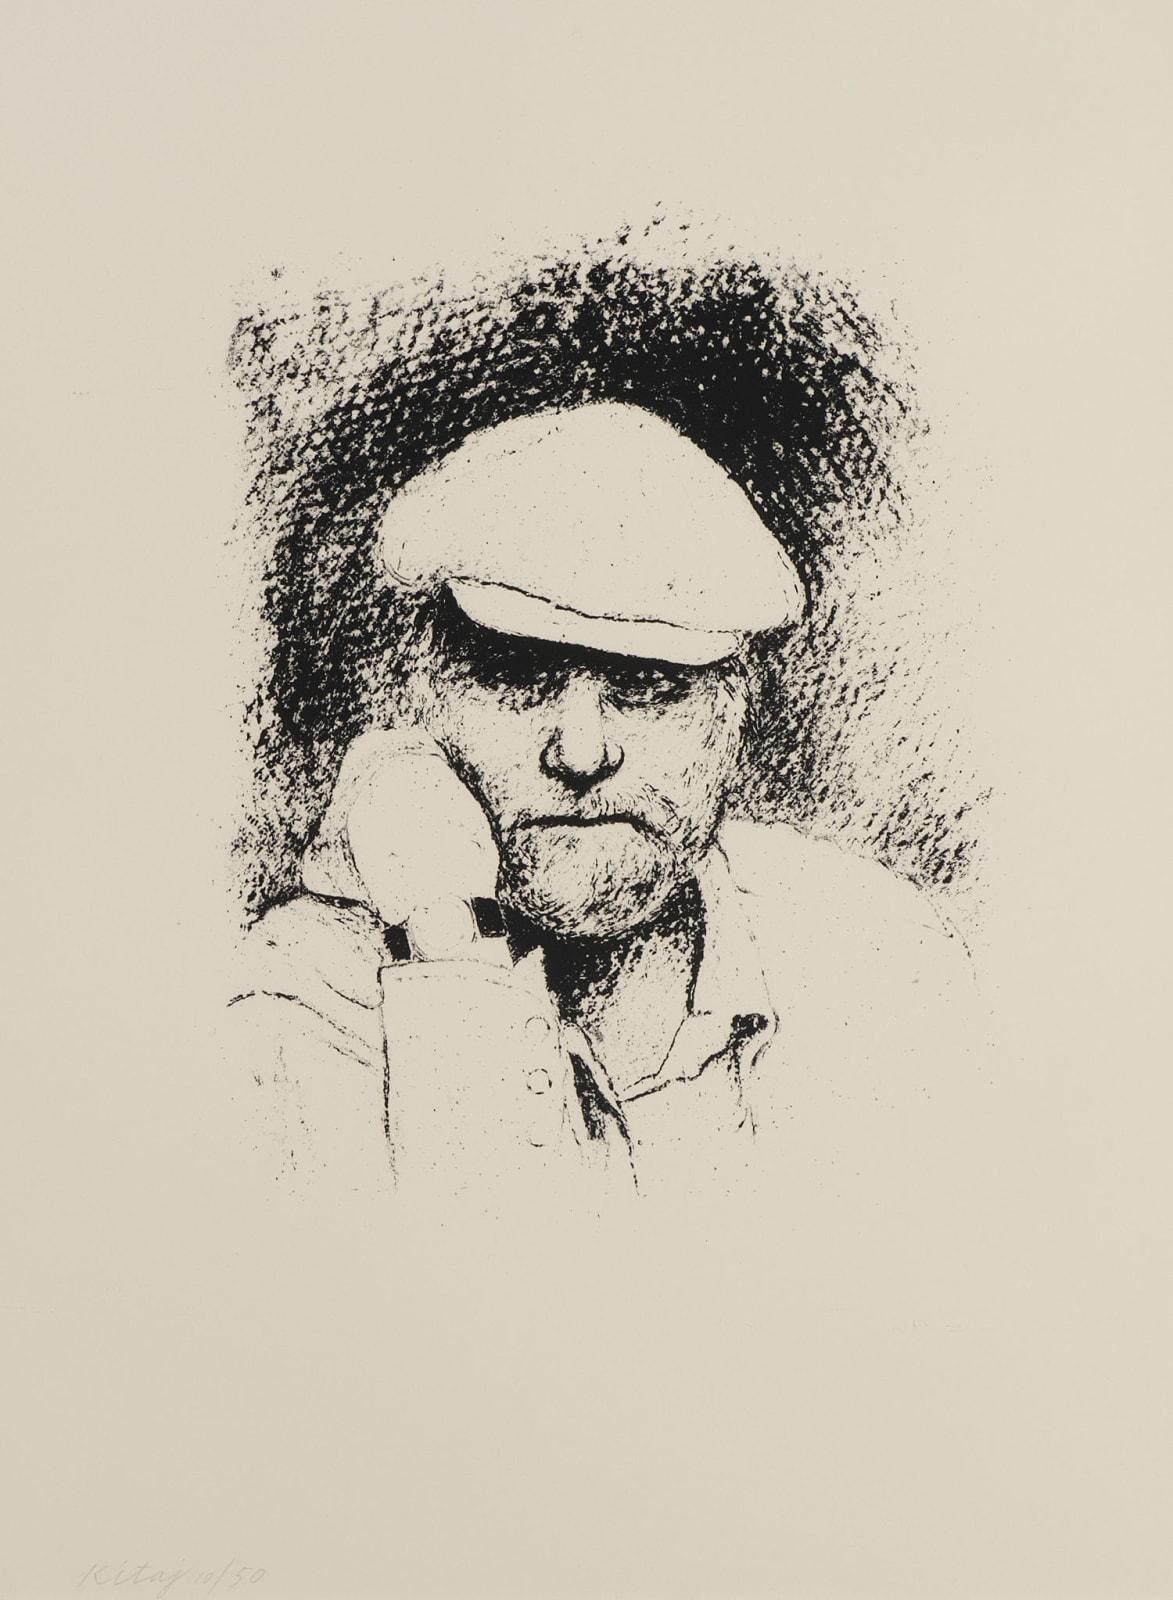 R. B. Kitaj (1932-2007) Self Portrait with Cap c.1975-76 Lithograph on paper 73 x 53.8 cm Ben Uri Collection © R. B. Kitaj estate